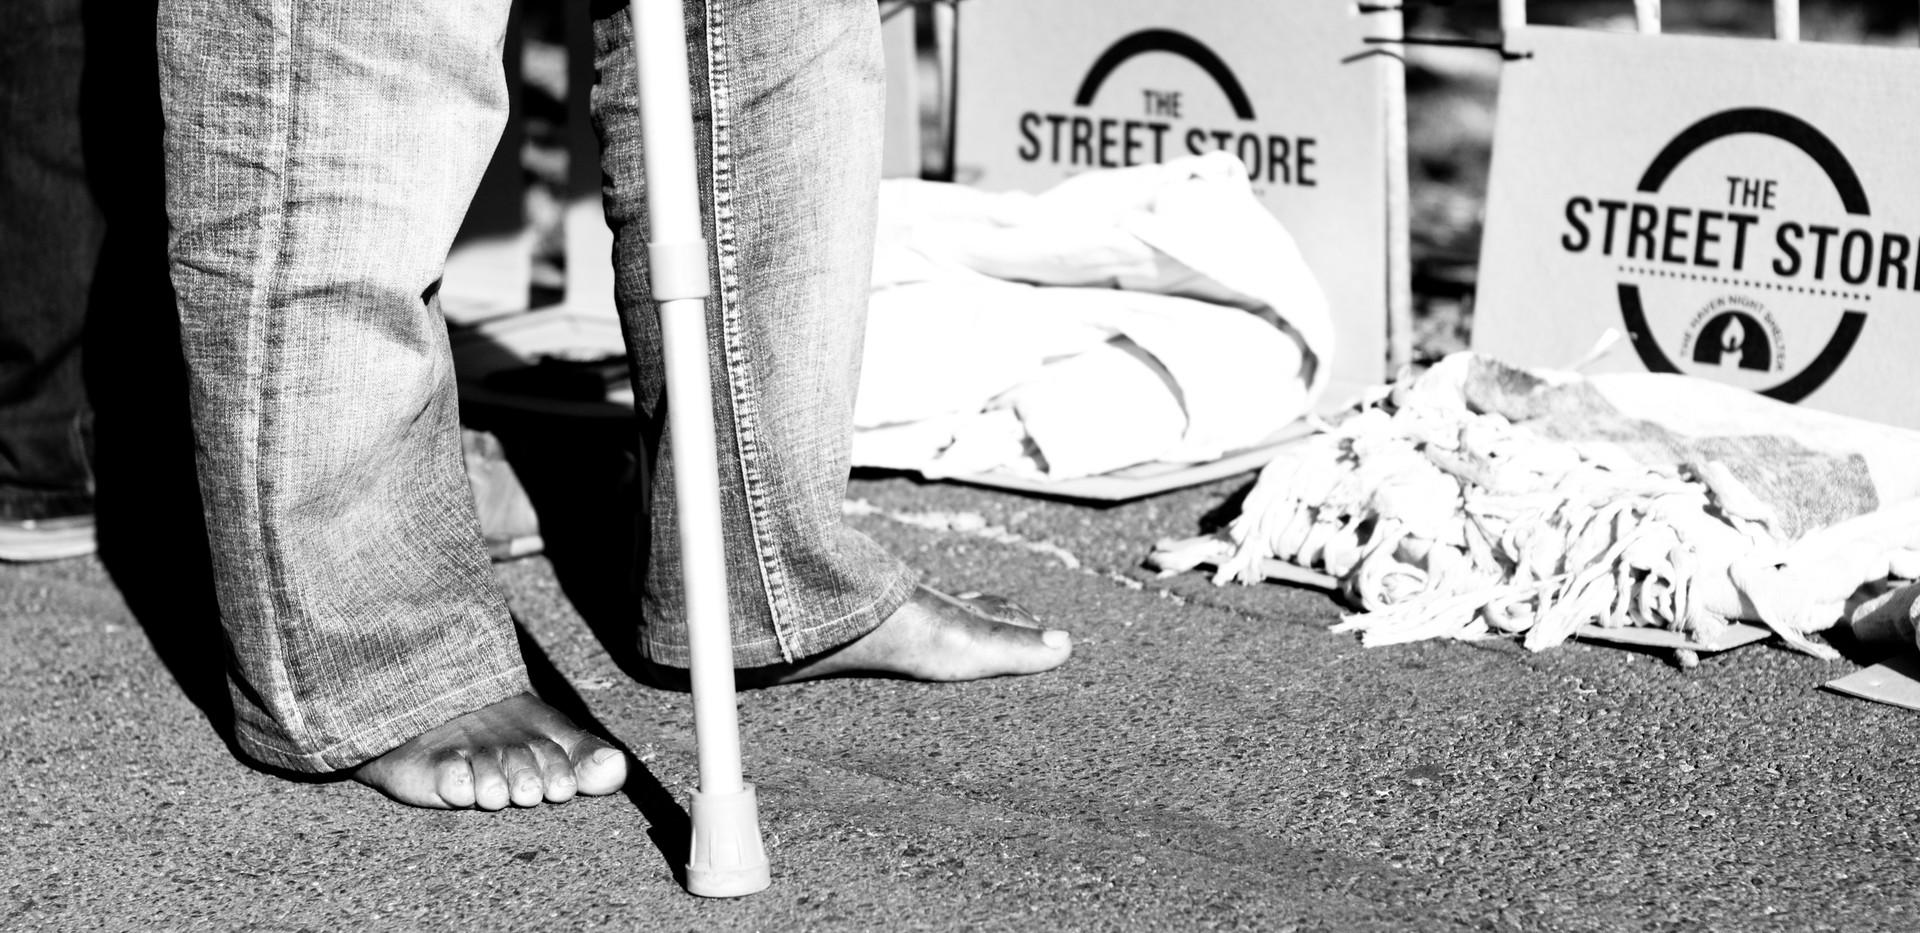 The-street-store-ii-300114-10138-1.jpg